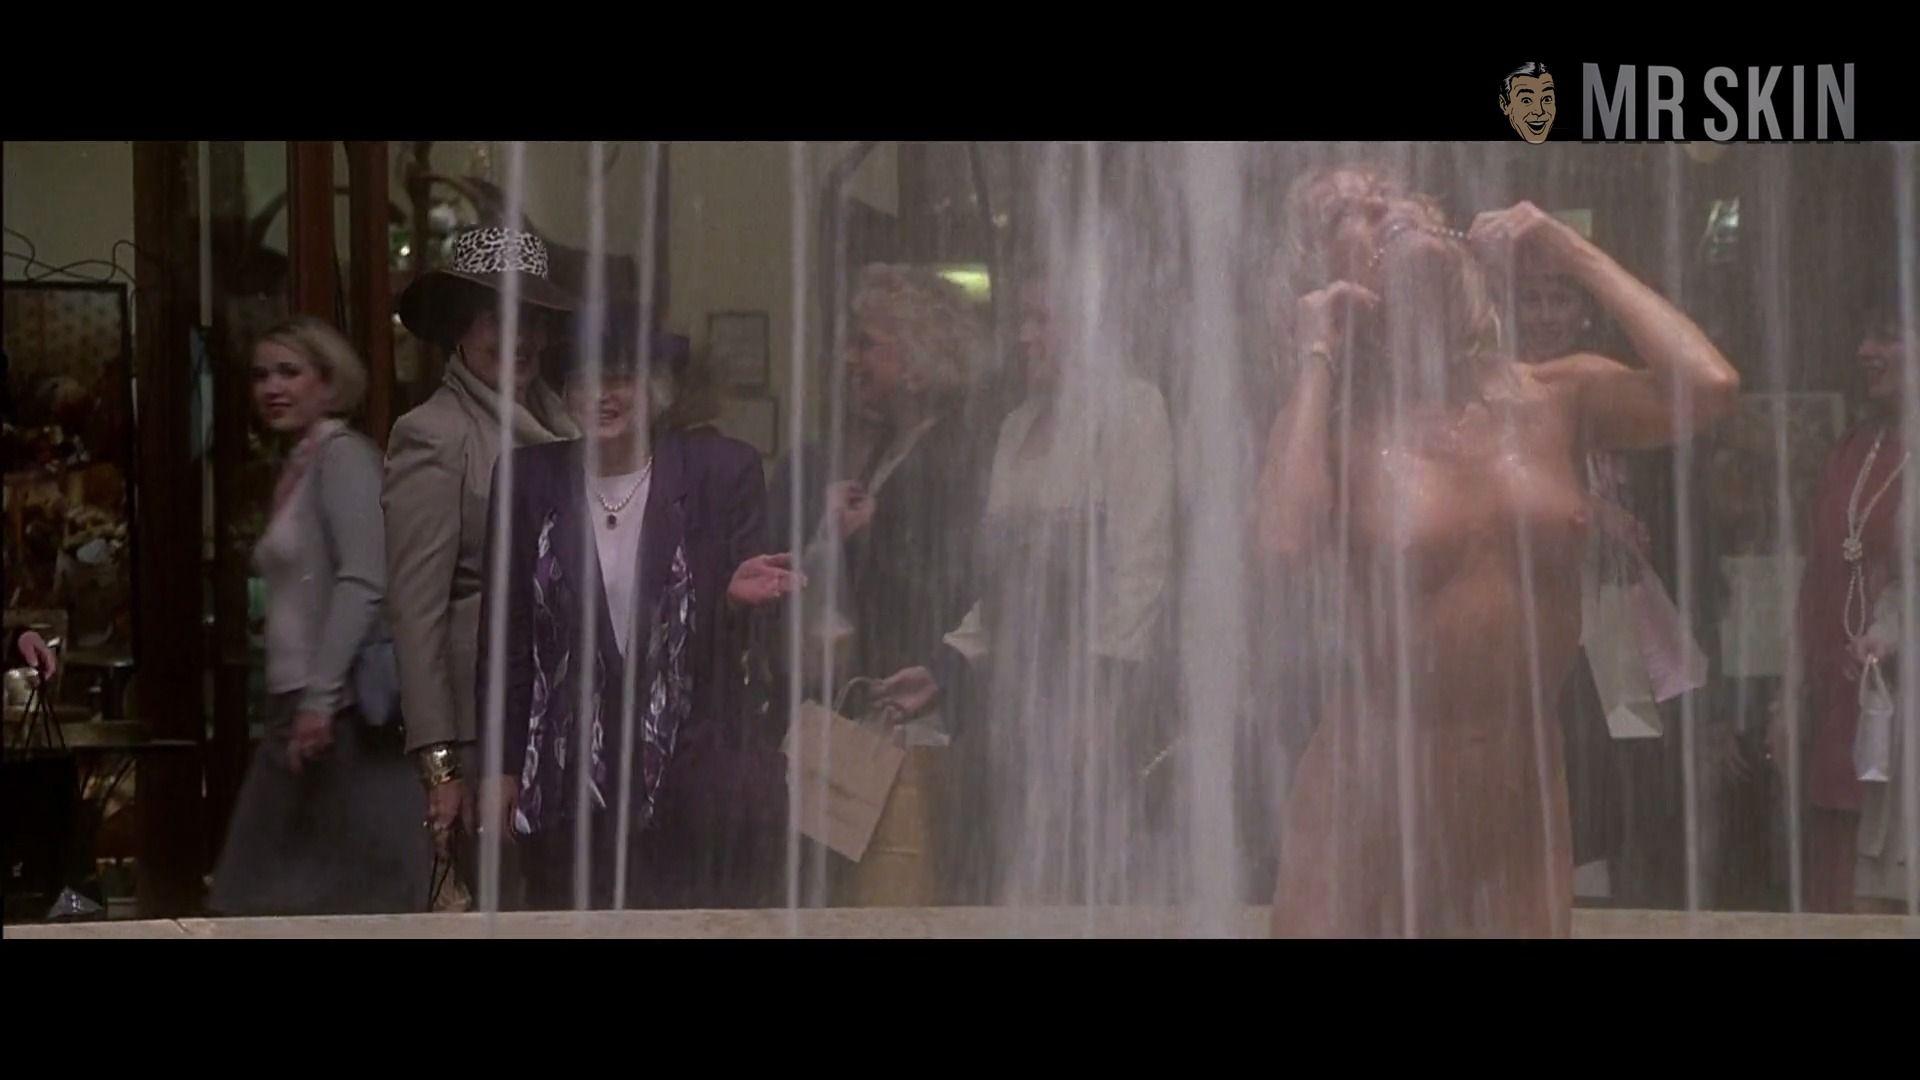 Topless Farrah Fawcett Free Nude Pic Gif